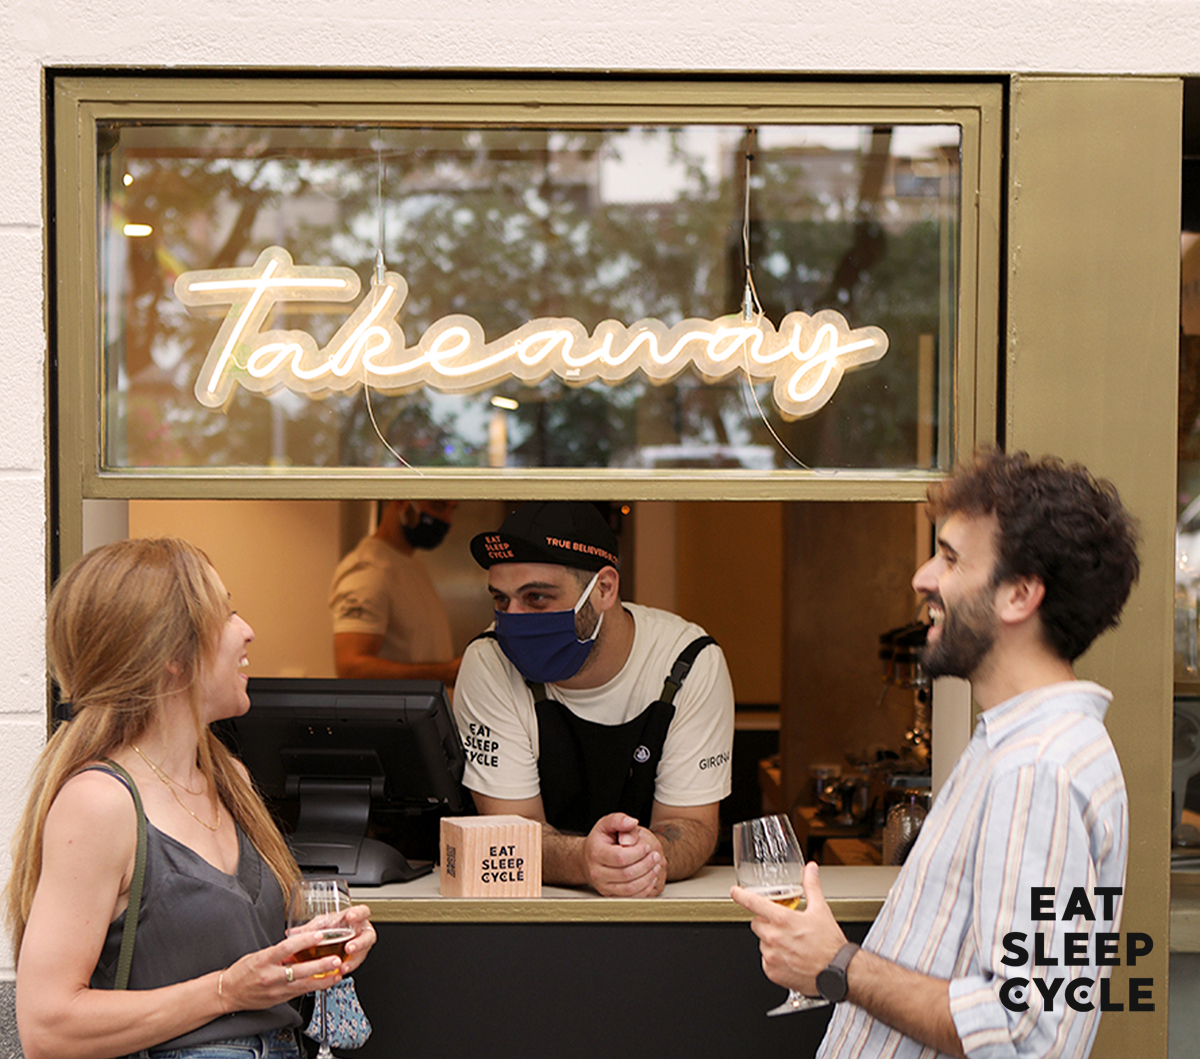 Eat-Sleep-Cycle-Hub-Cafe-Cycling-Cafe-Girona